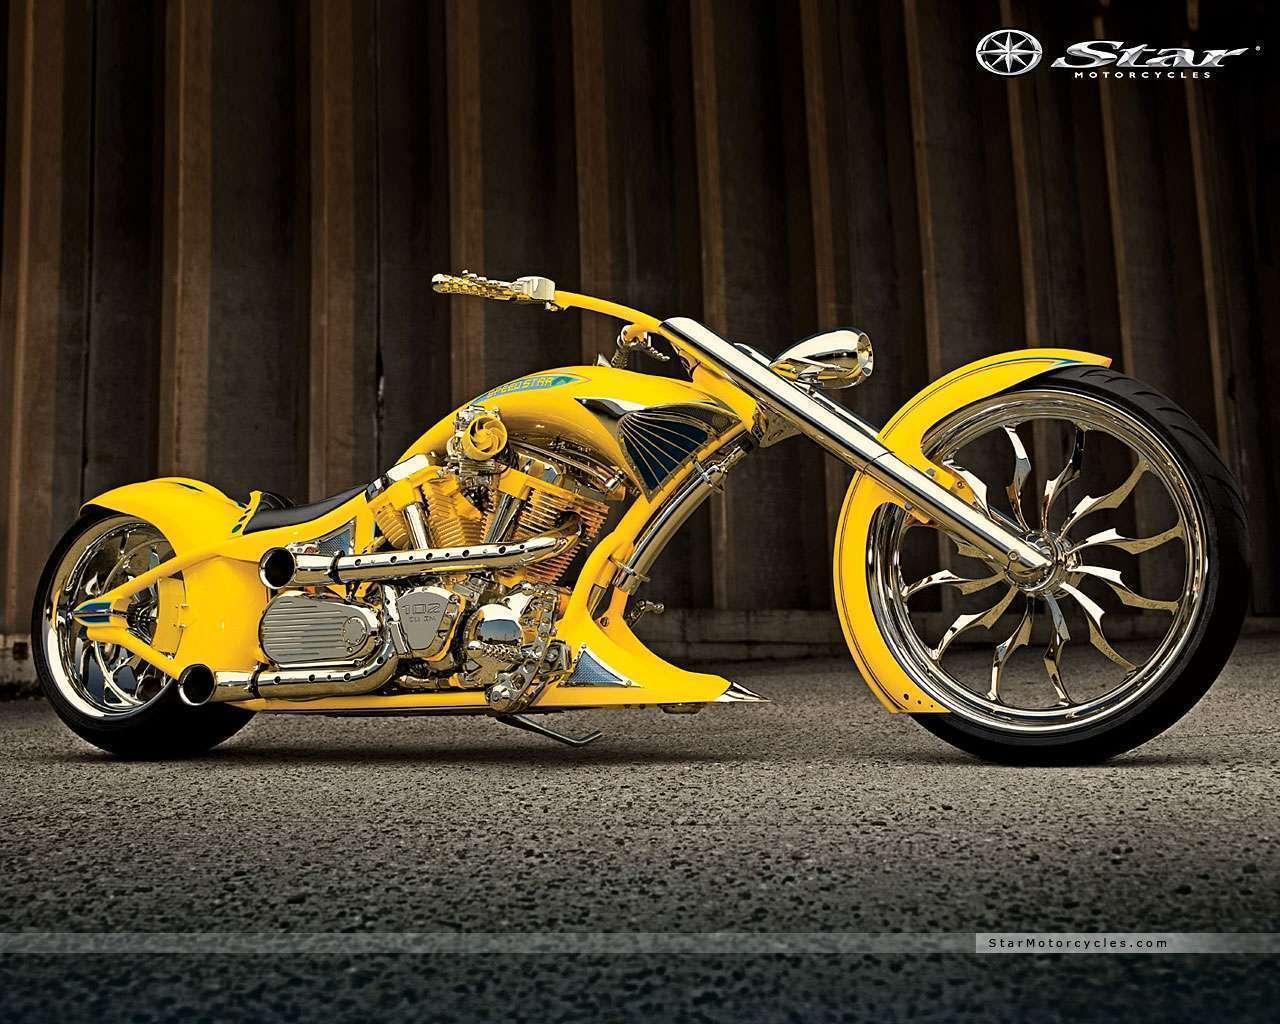 View Of Chopper Yellow Wallpaper Hd Car Wallpapers 1280x1024